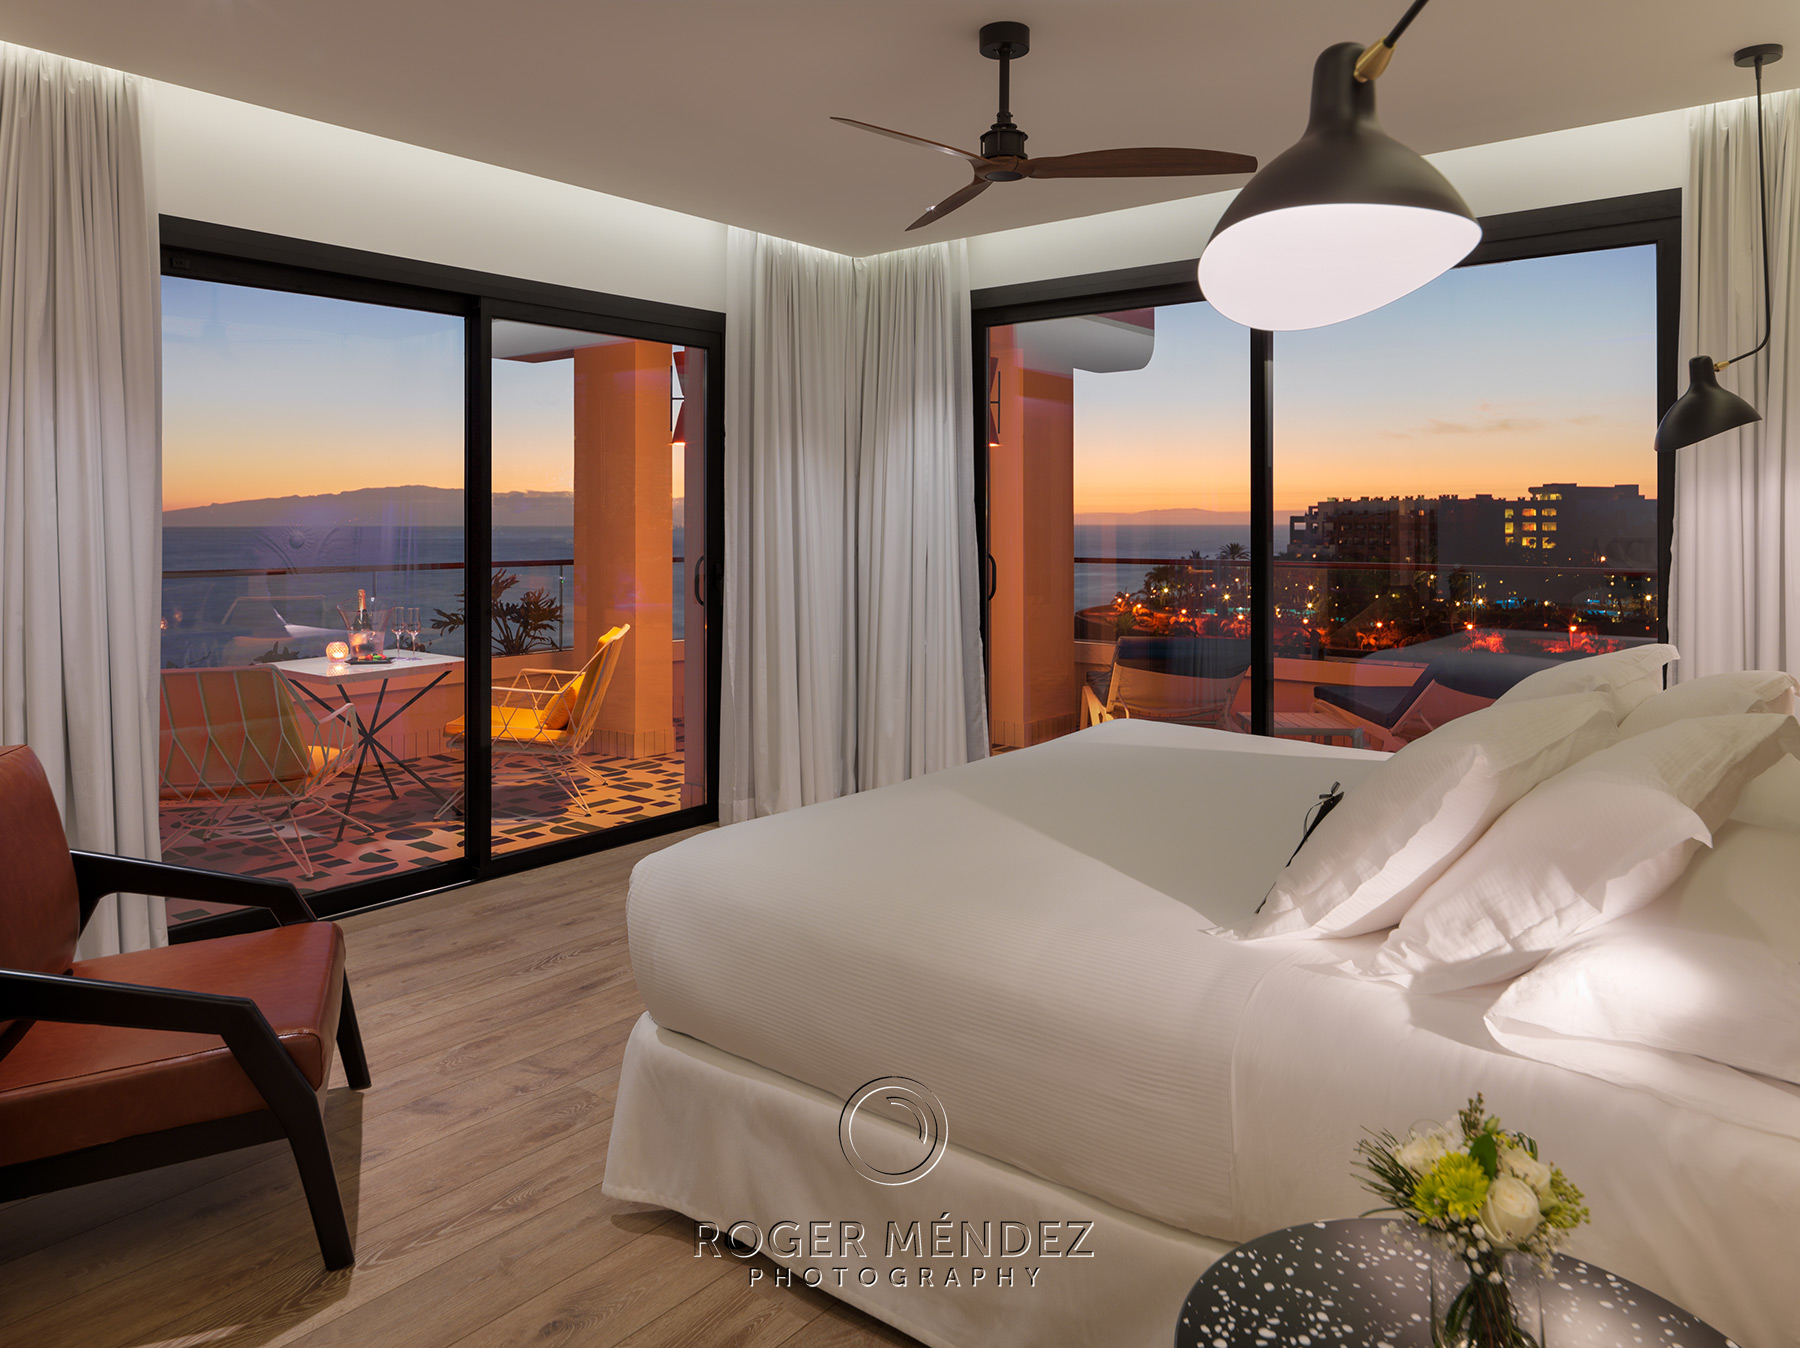 Dormitorio suite privilege al anochecer. H10 Atlantic Sunset